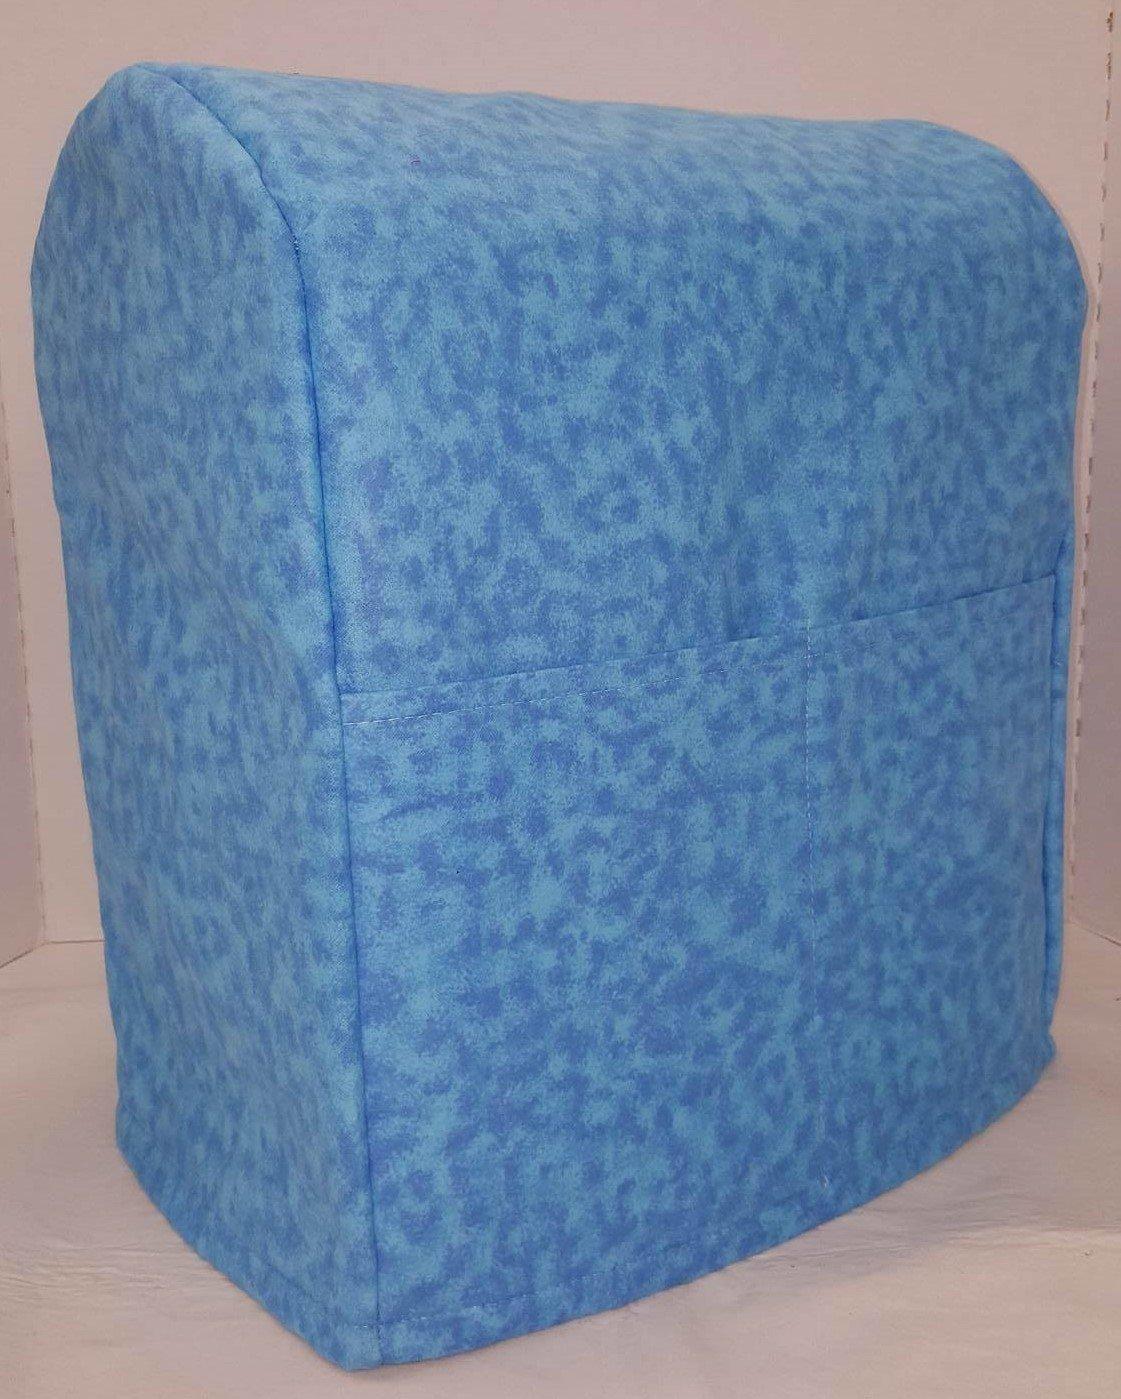 Amazon.com: Kitchenaid Stand Mixer Cover (4.5, 5, 6qt Lift Bowl ...